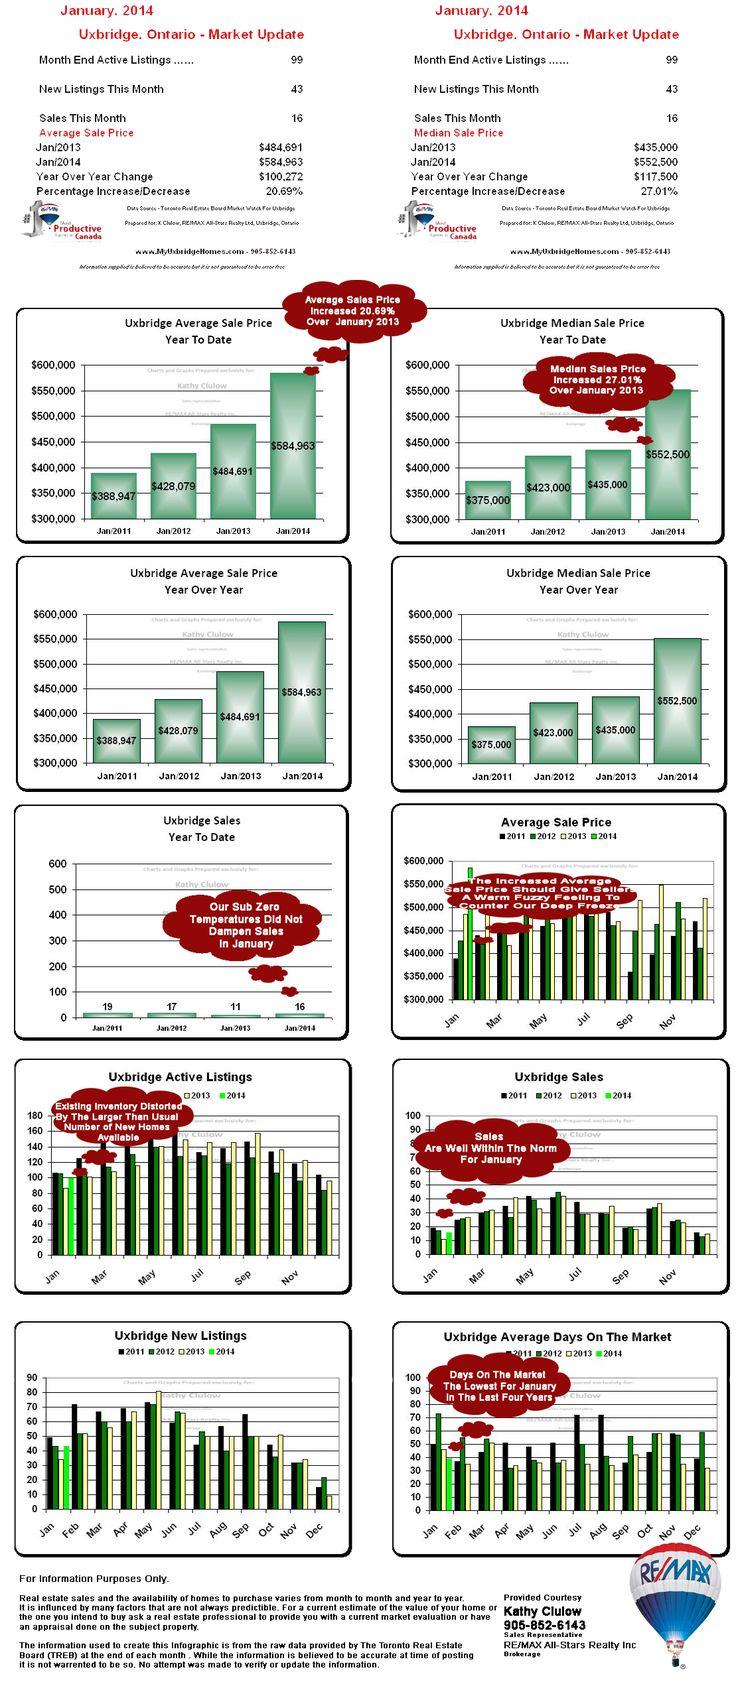 January 2014 Uxbridge Real Estate Market Update by  #KathyClulow 905.852.6143 www.KathyClulow.ca